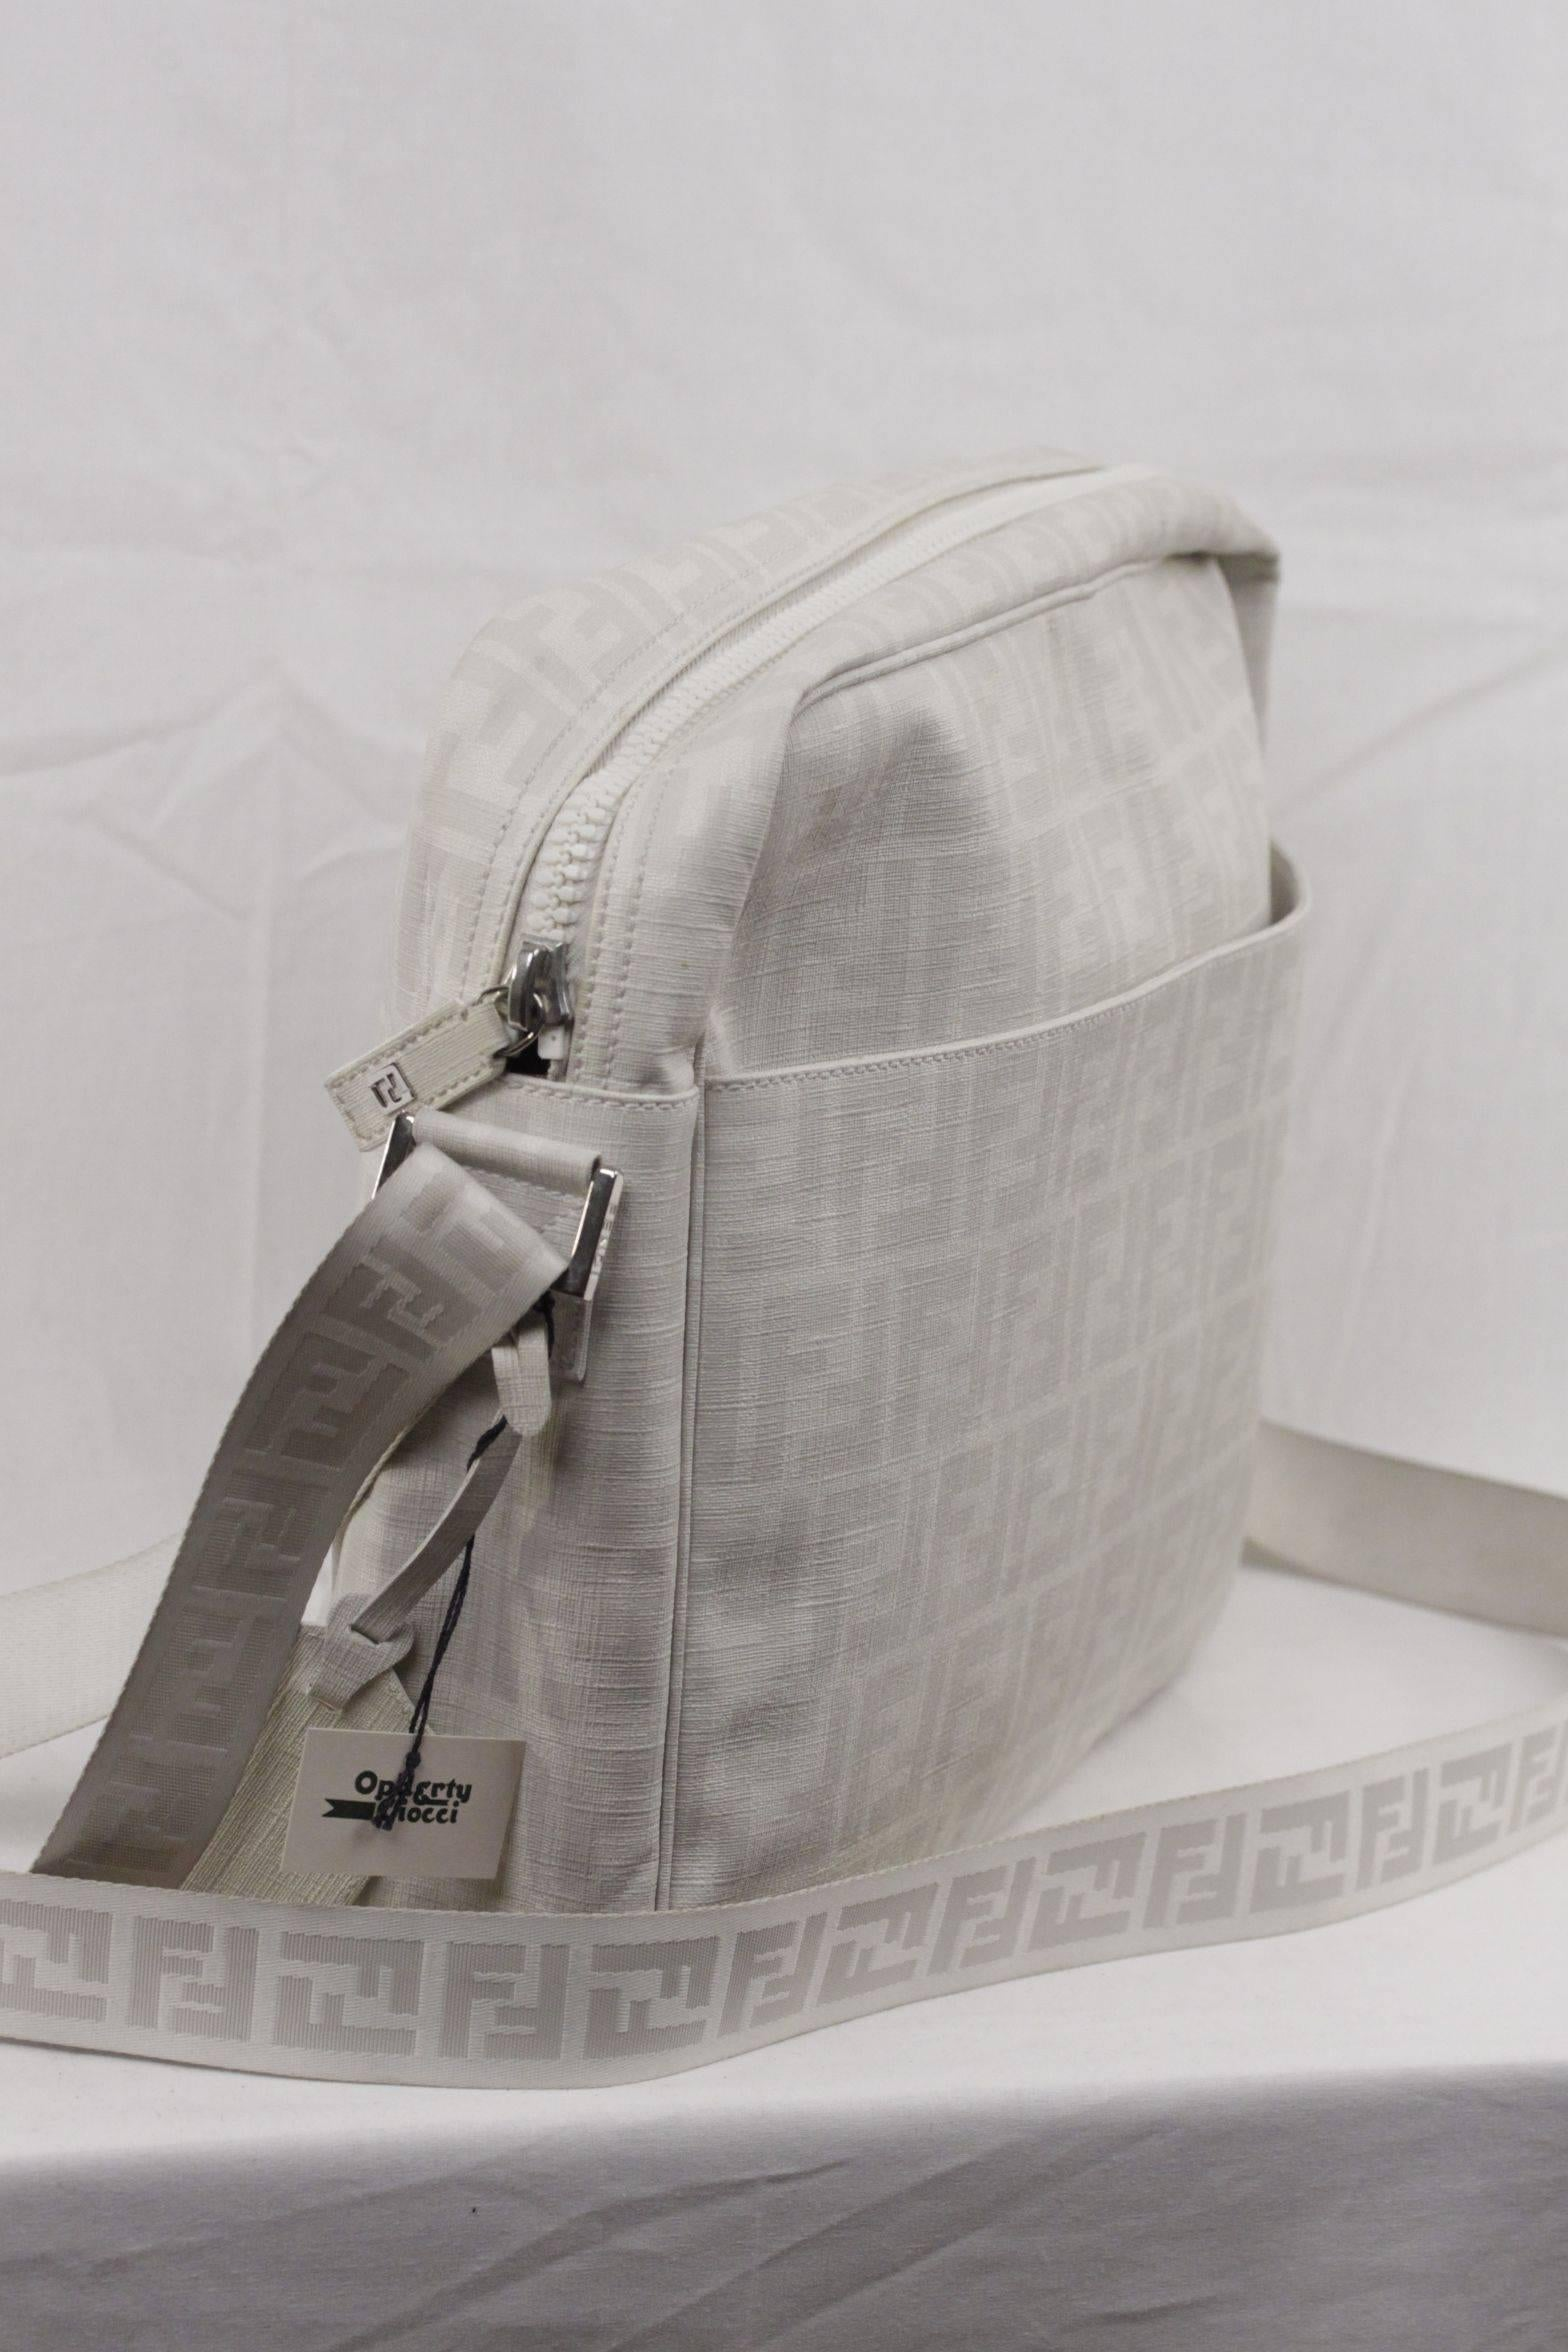 97e002a3f159 ... best price fendi white ff monogram canvas large messenger bag crossbody  for sale at 1stdibs 9612b